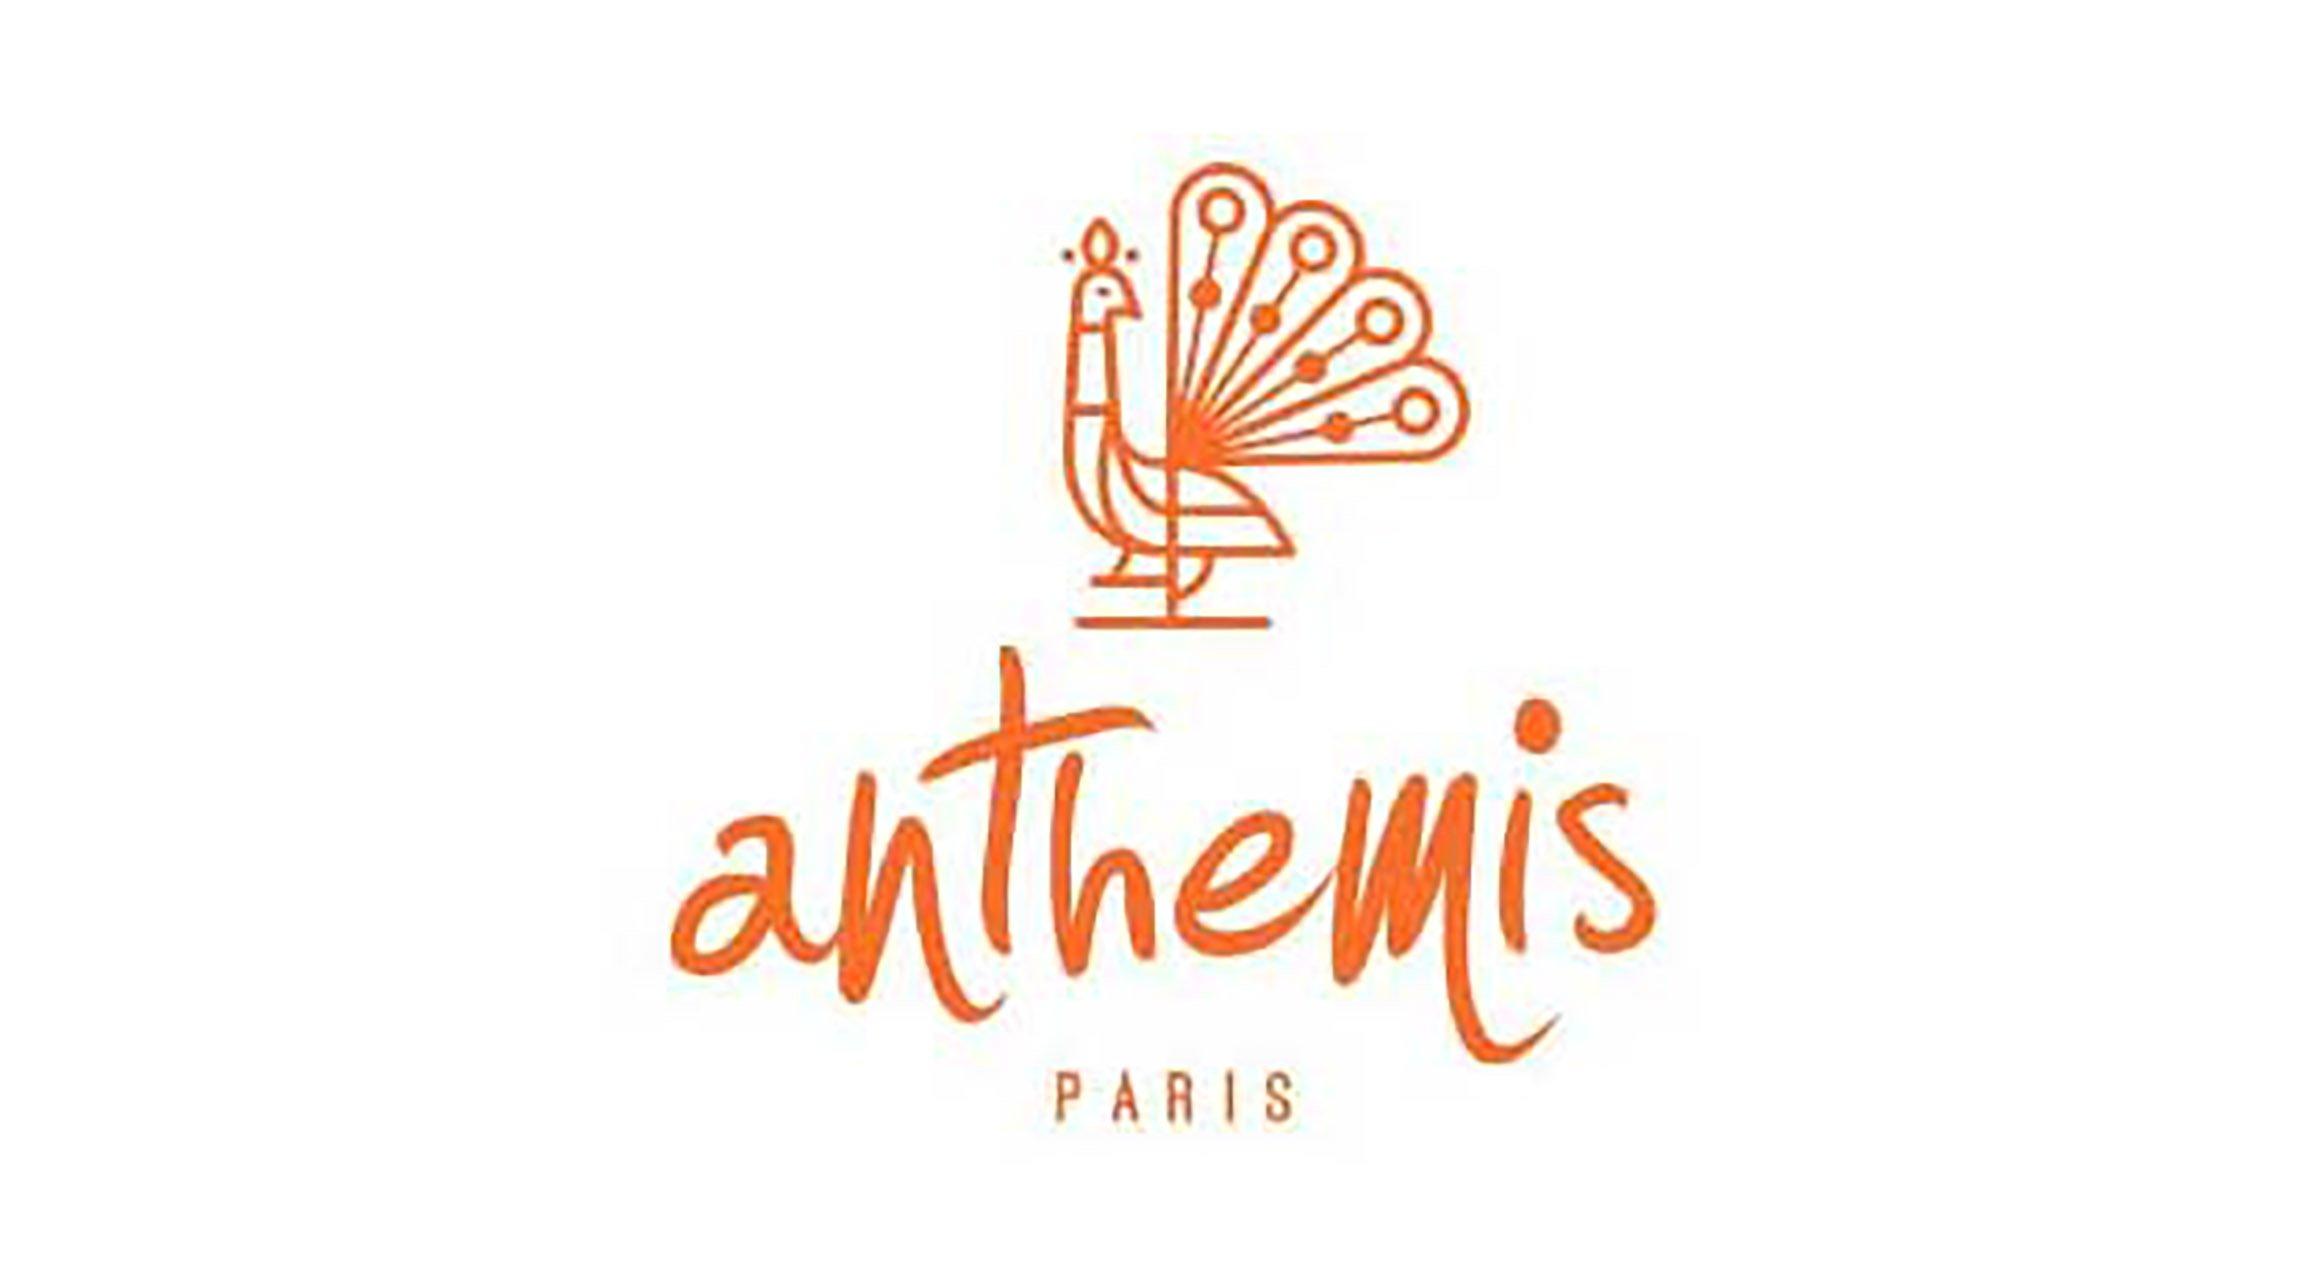 logo anthemis